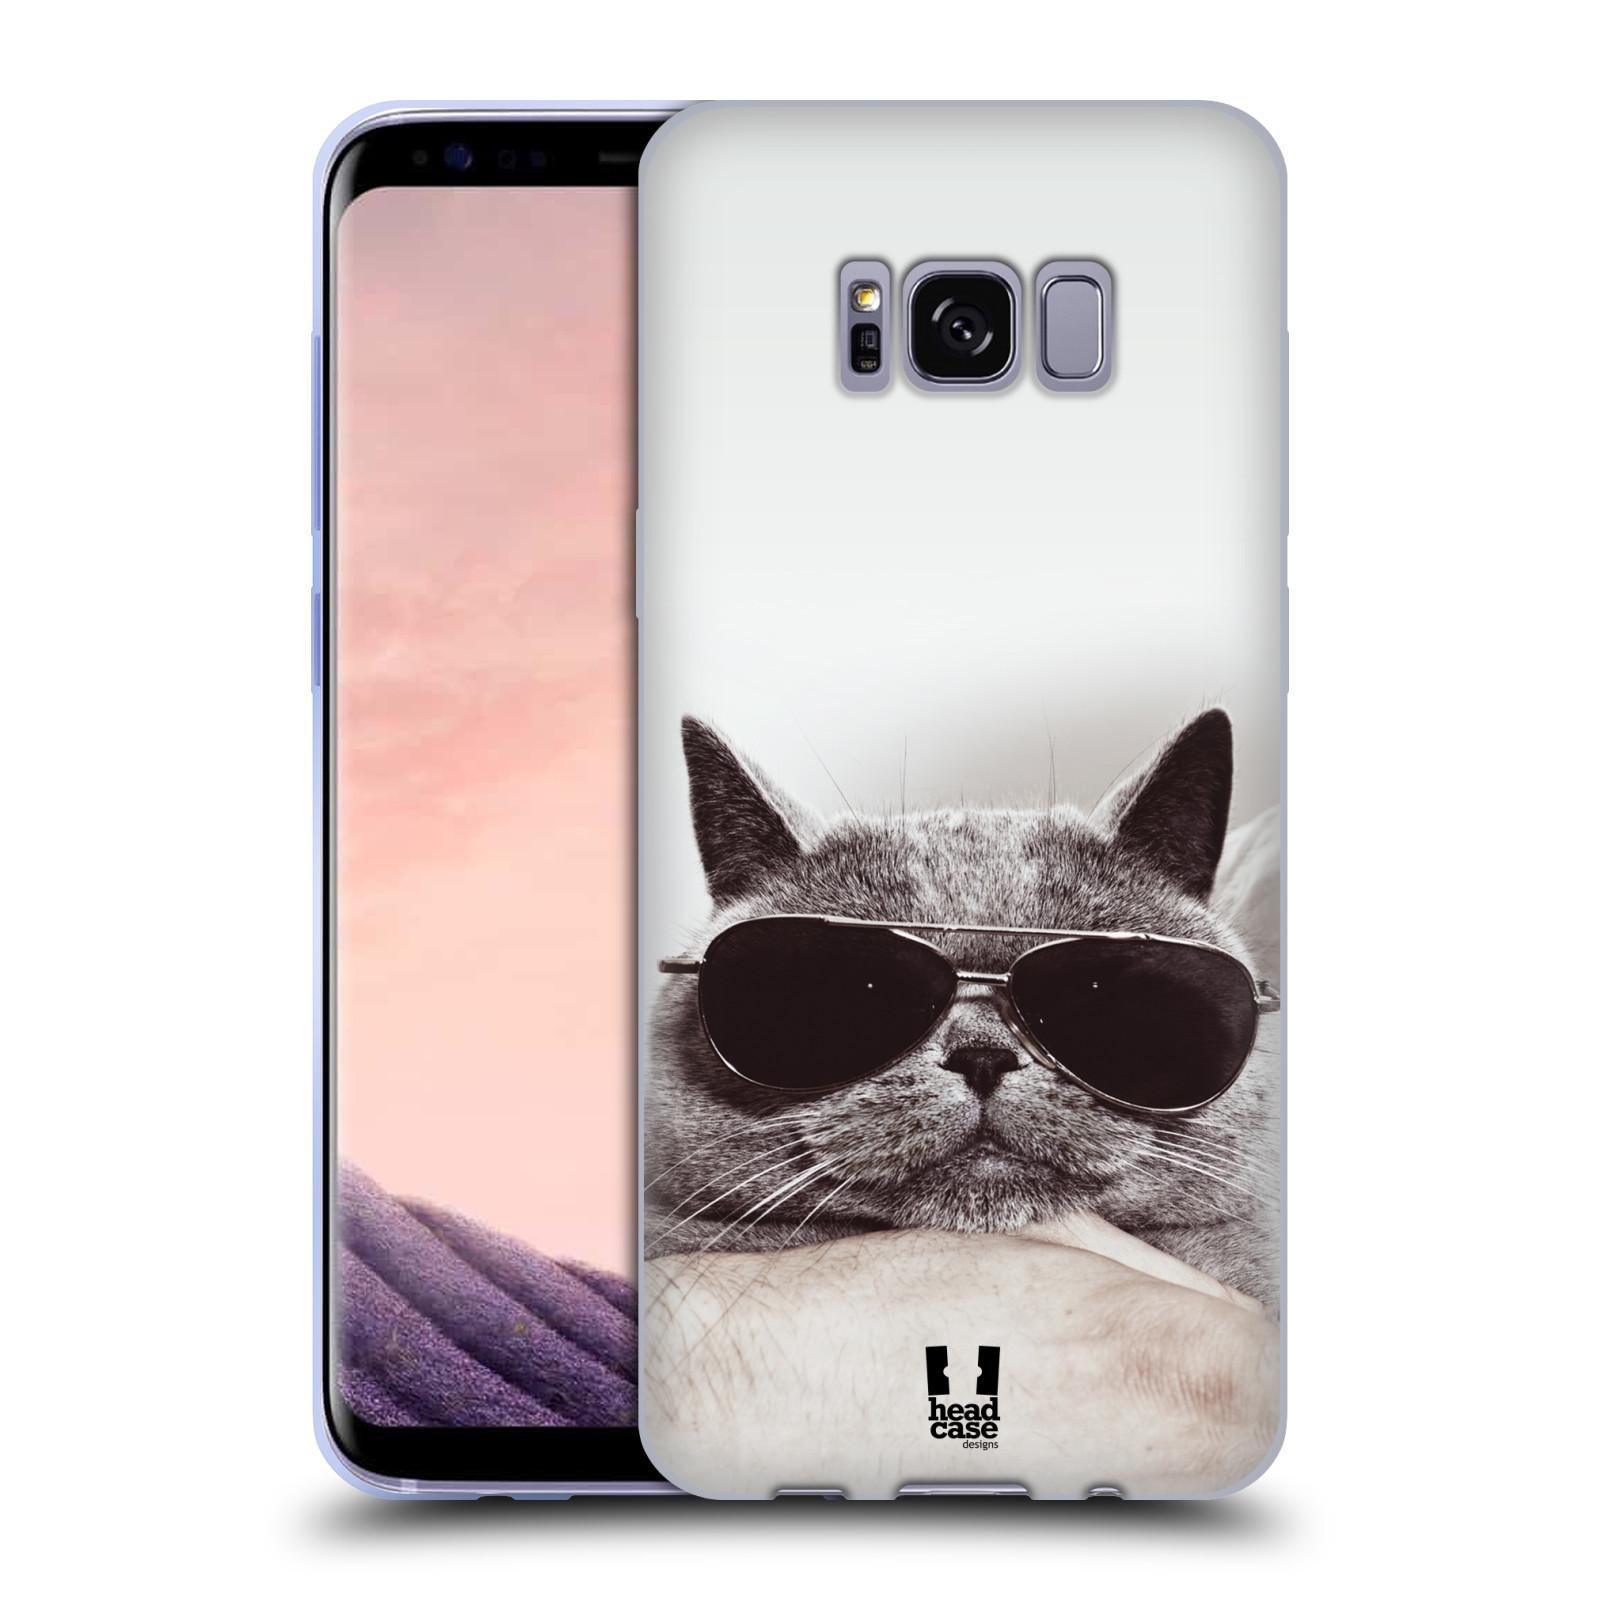 Silikonové pouzdro na mobil Samsung Galaxy S8 Head Case KOTĚ S BRÝLEMI (Silikonový kryt či obal na mobilní telefon Samsung Galaxy S8 SM-G9500)